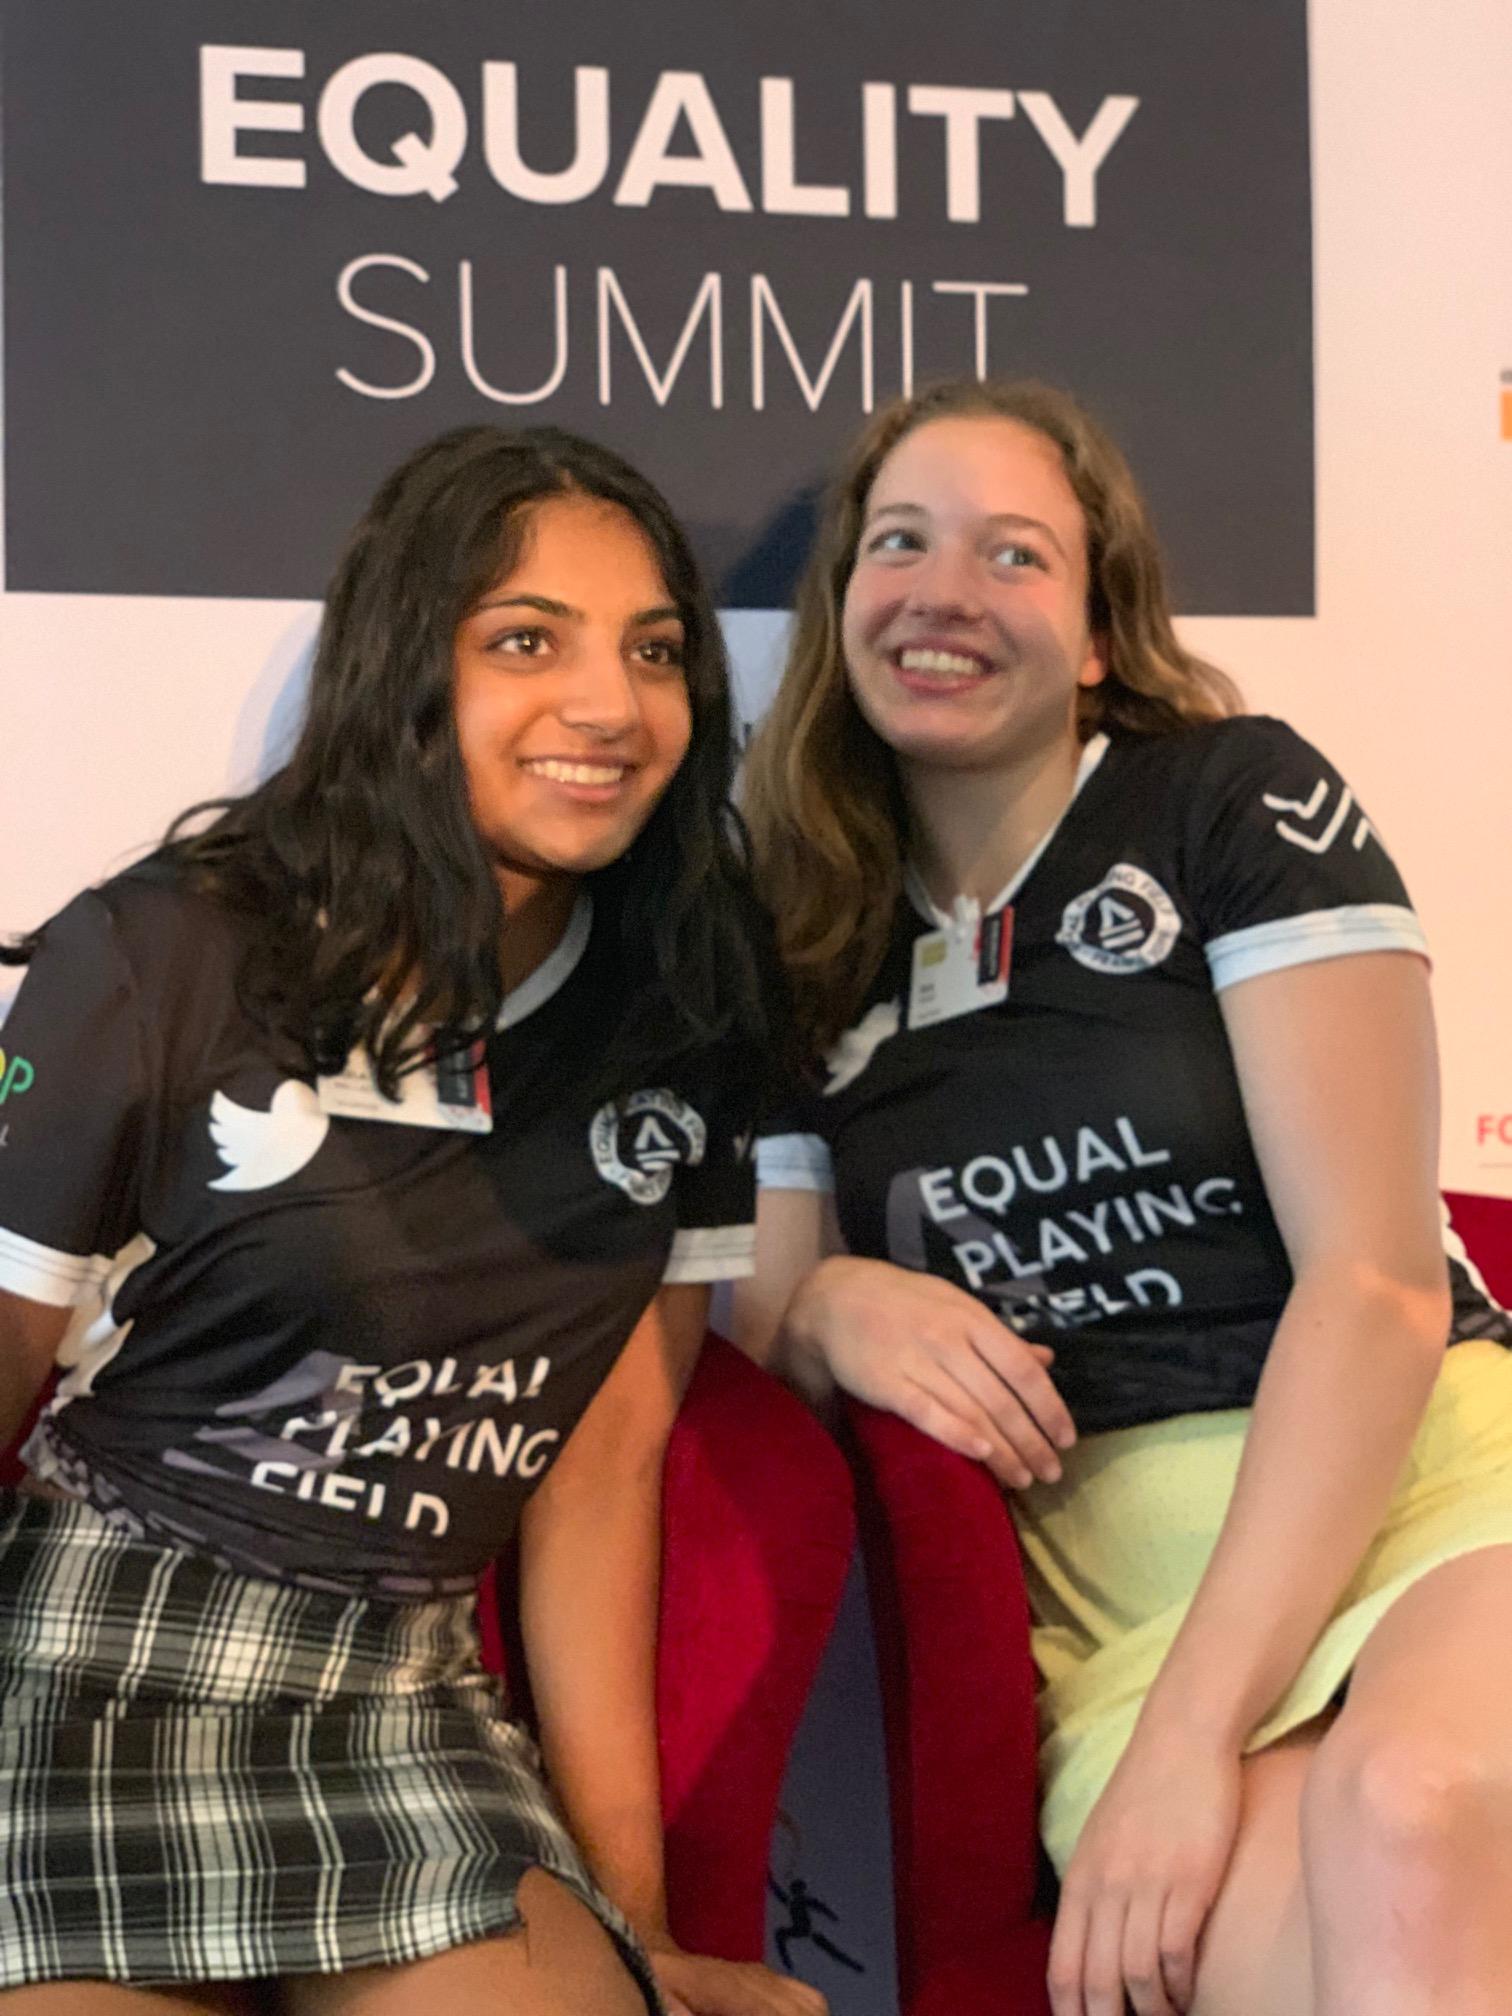 Equality Summit